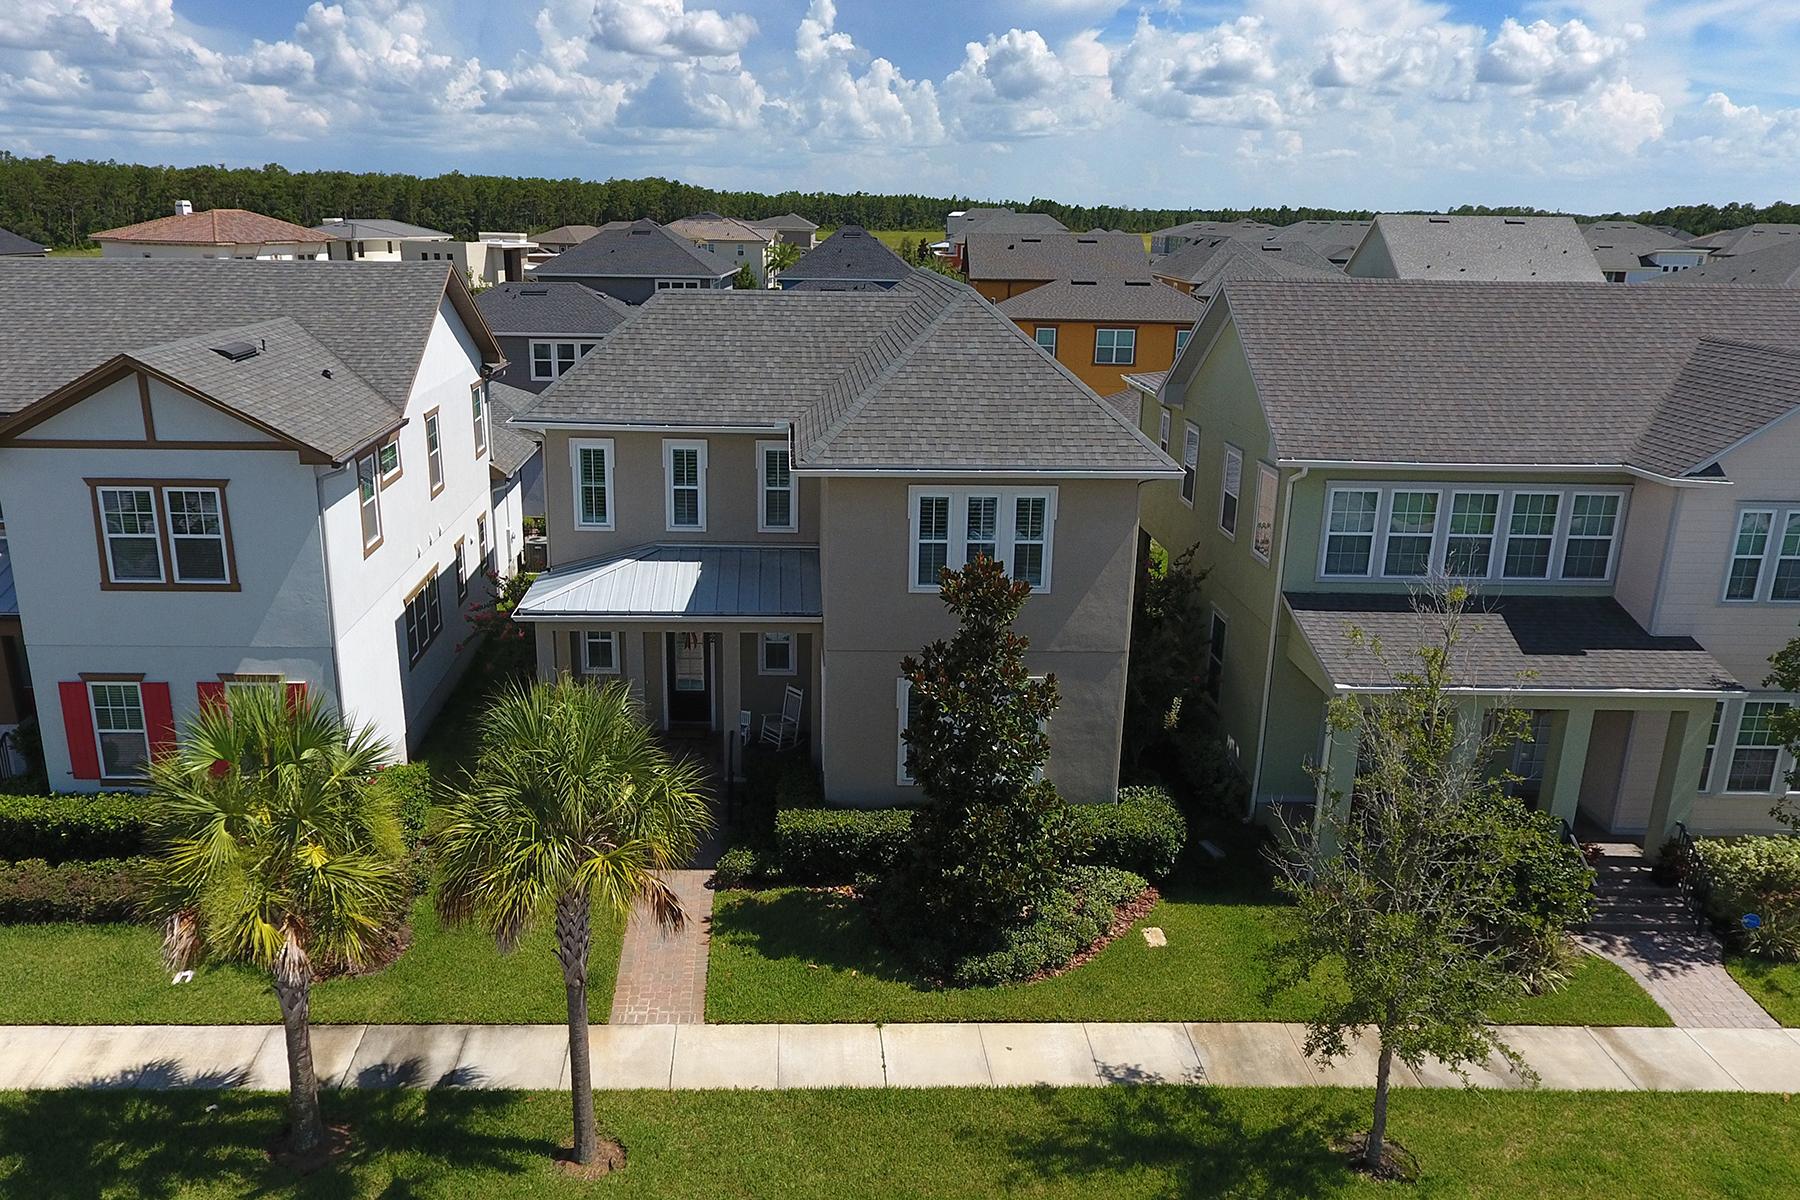 Single Family Home for Sale at LAKE NONA 8382 Laureate Blvd Orlando, Florida, 32827 United States